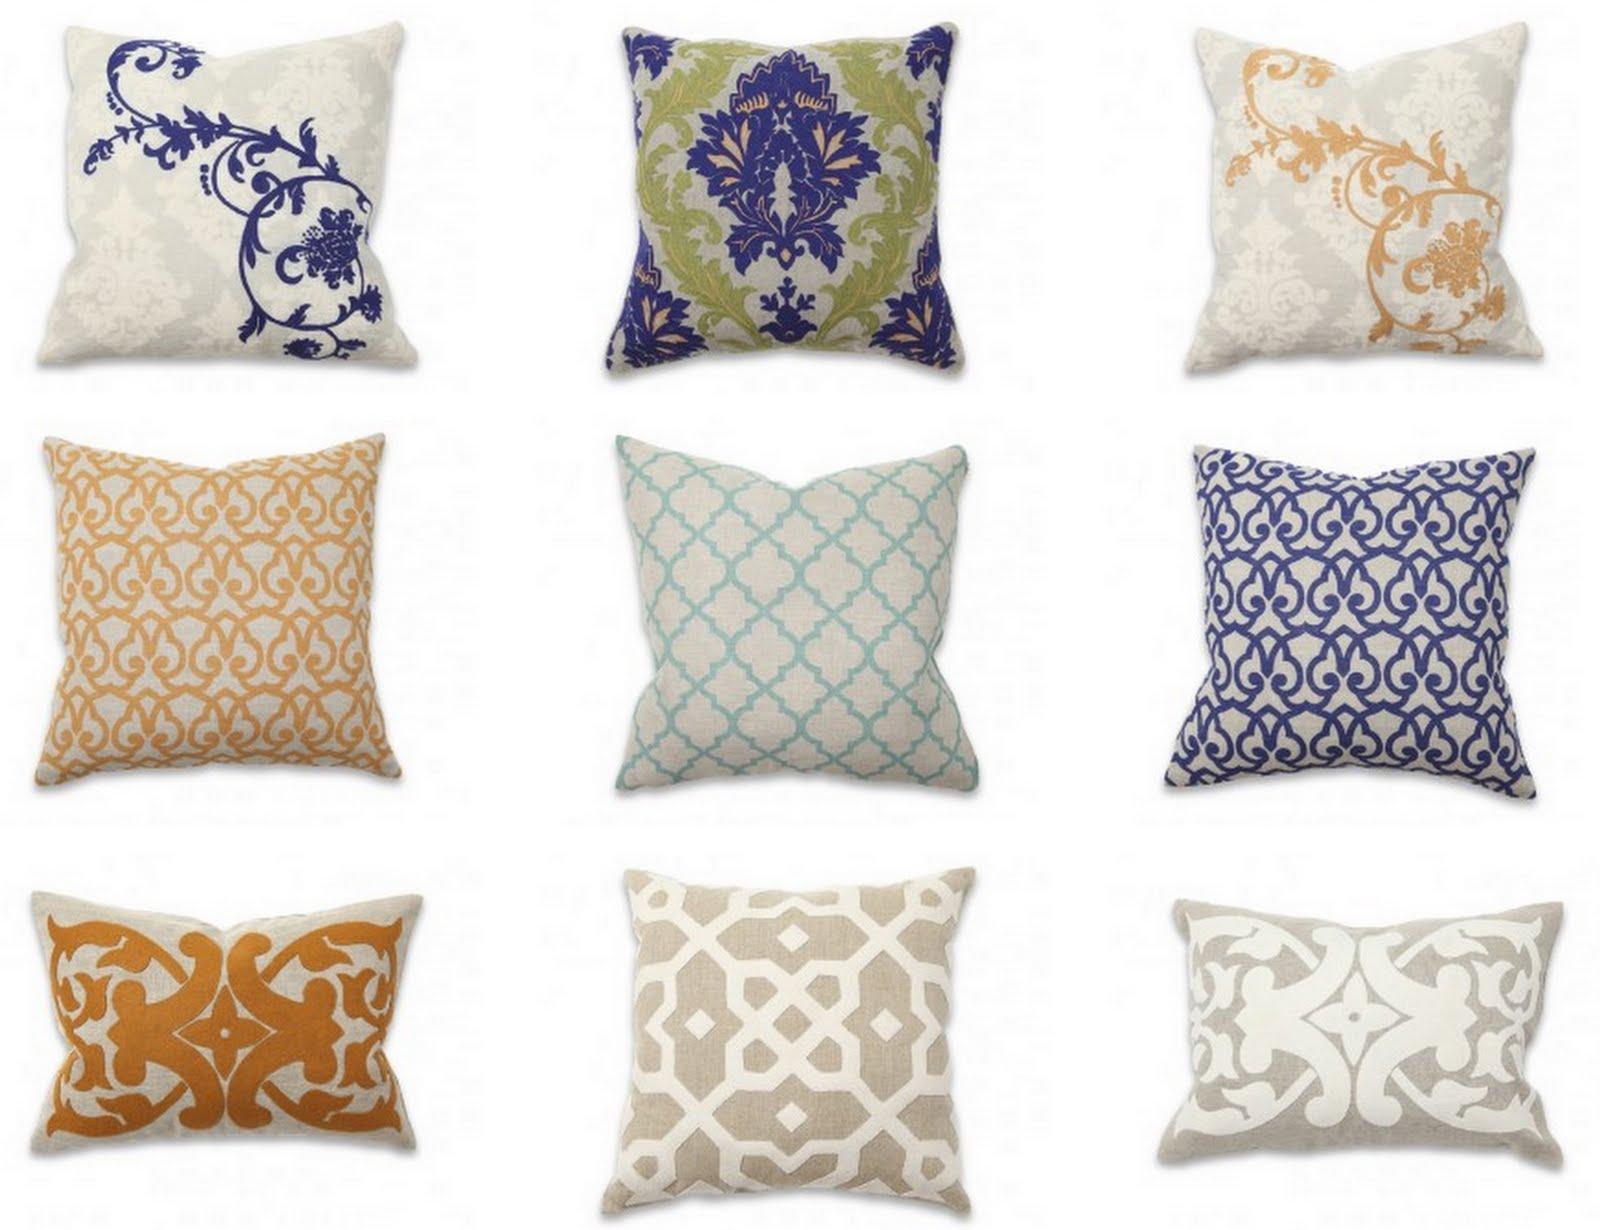 Decorative Pillows Pictures : Decorative Pillows On Sale